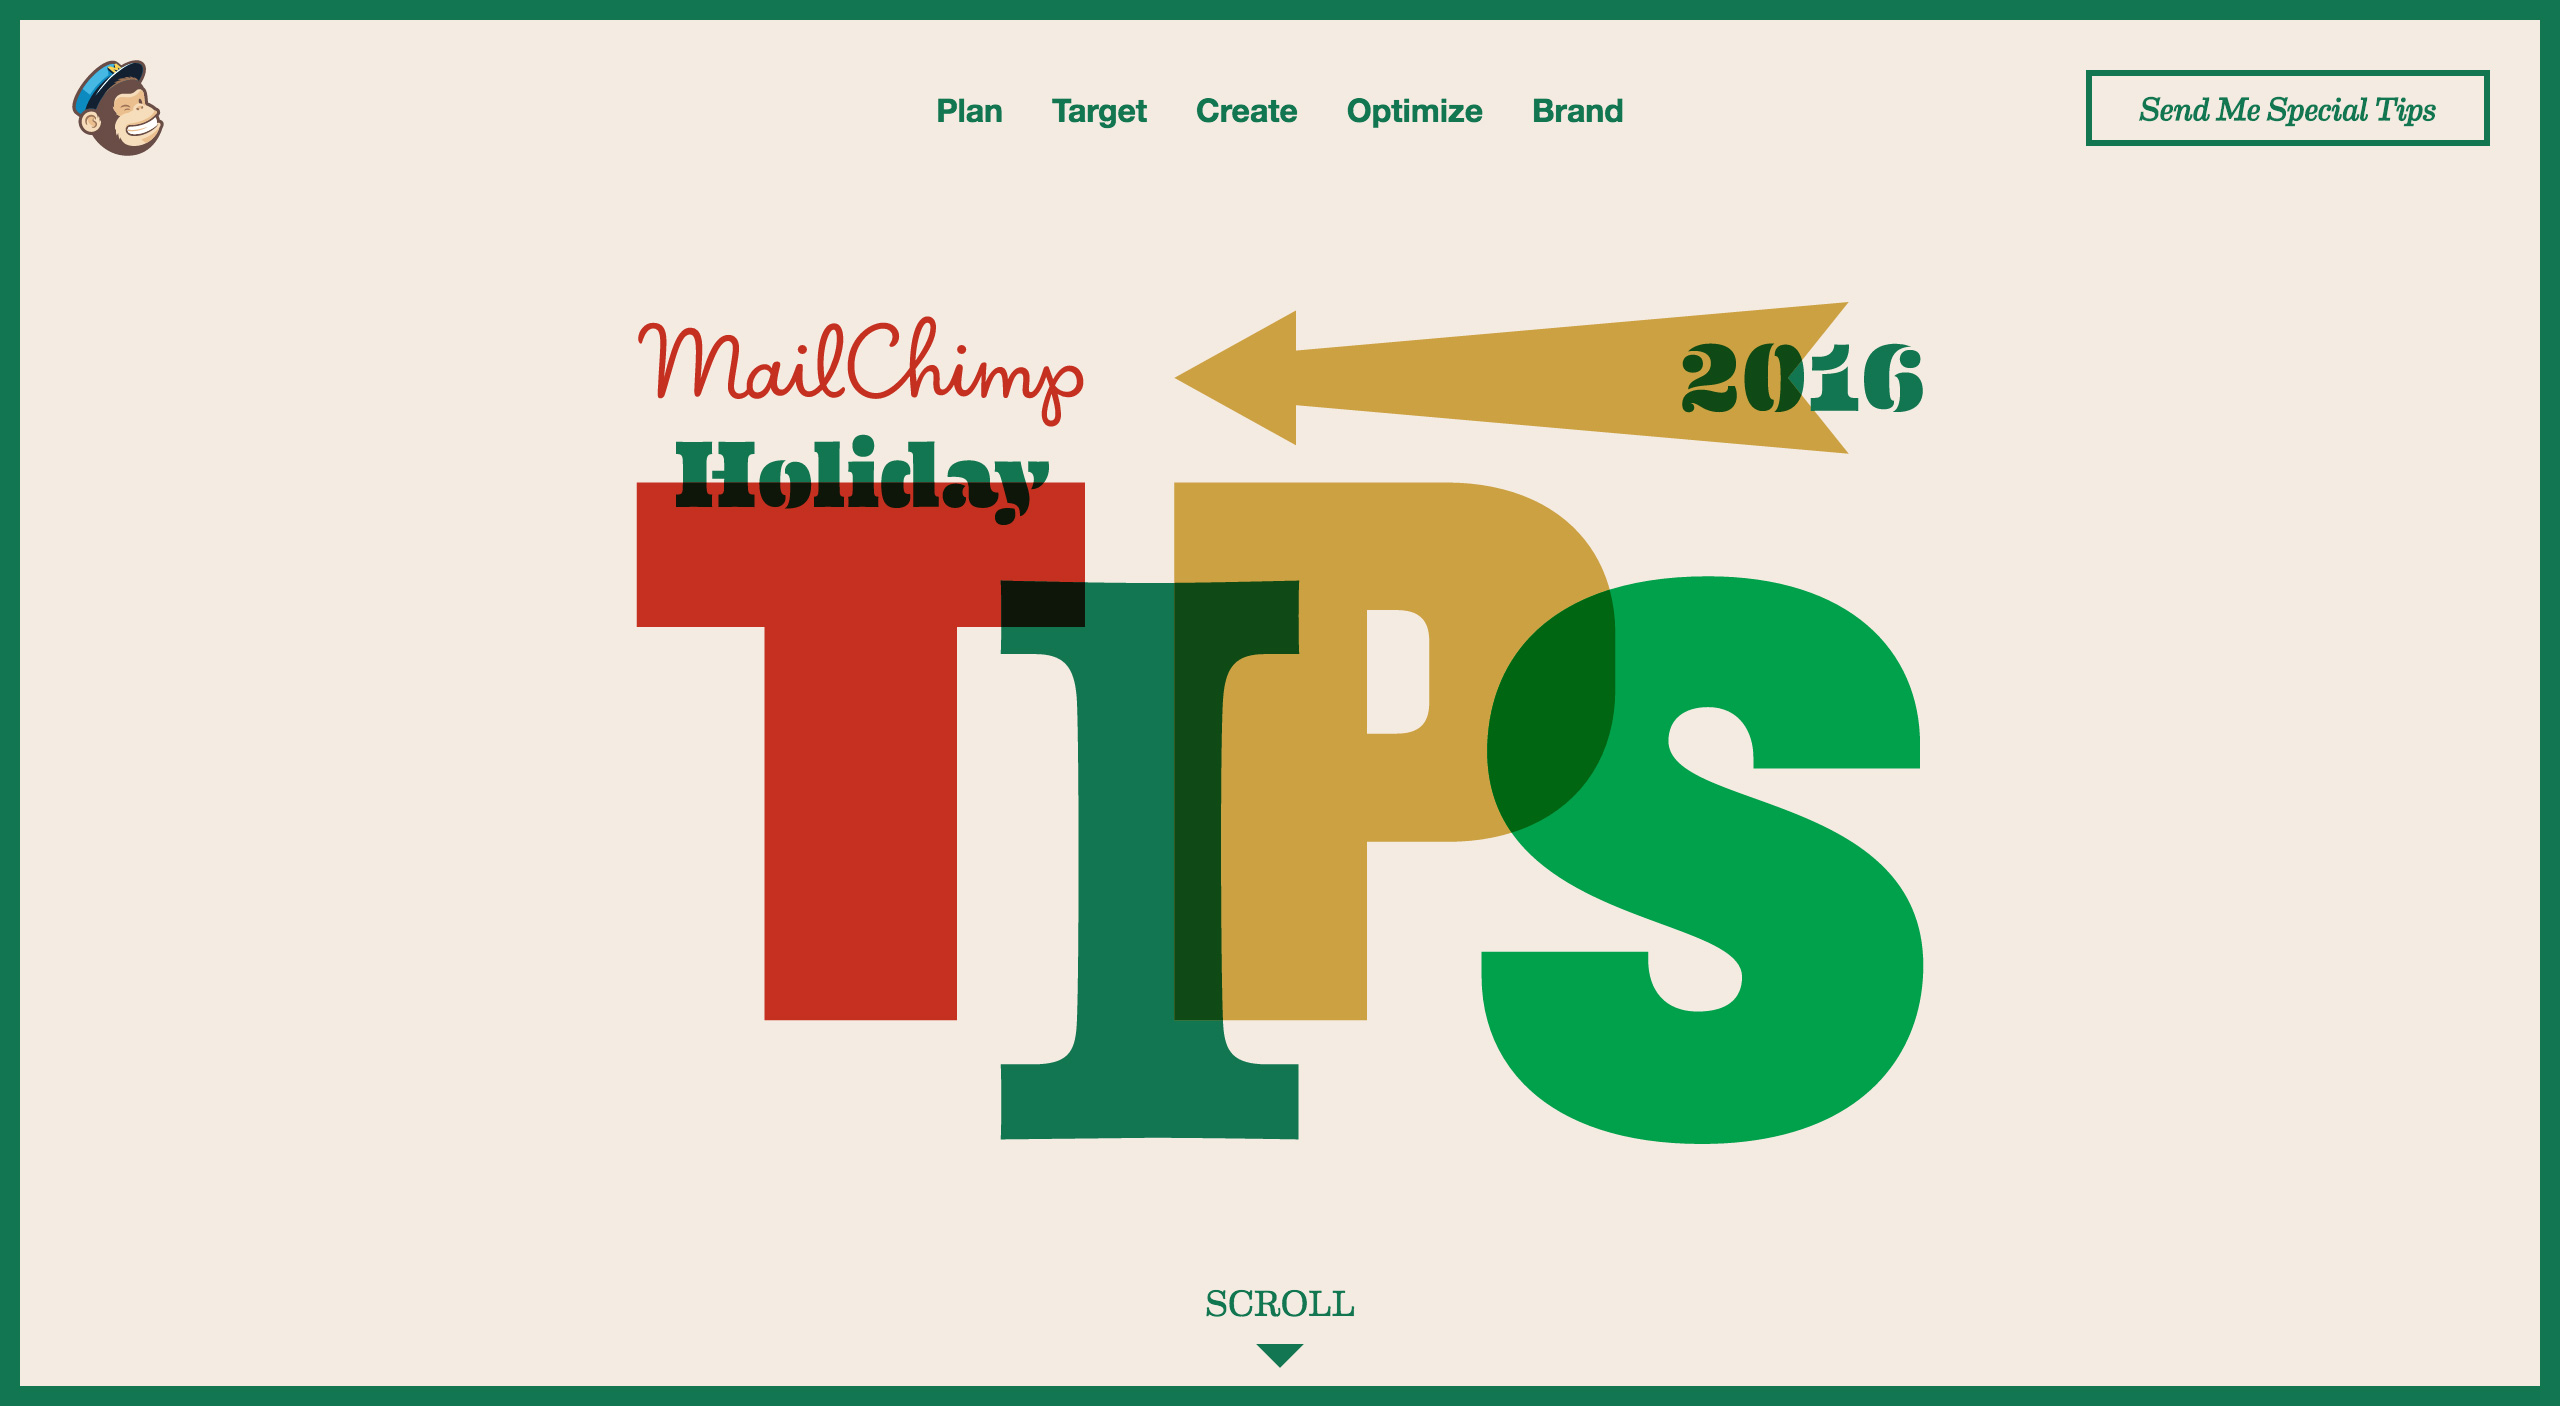 MailChimp Holiday Tips 2016 Website Screenshot